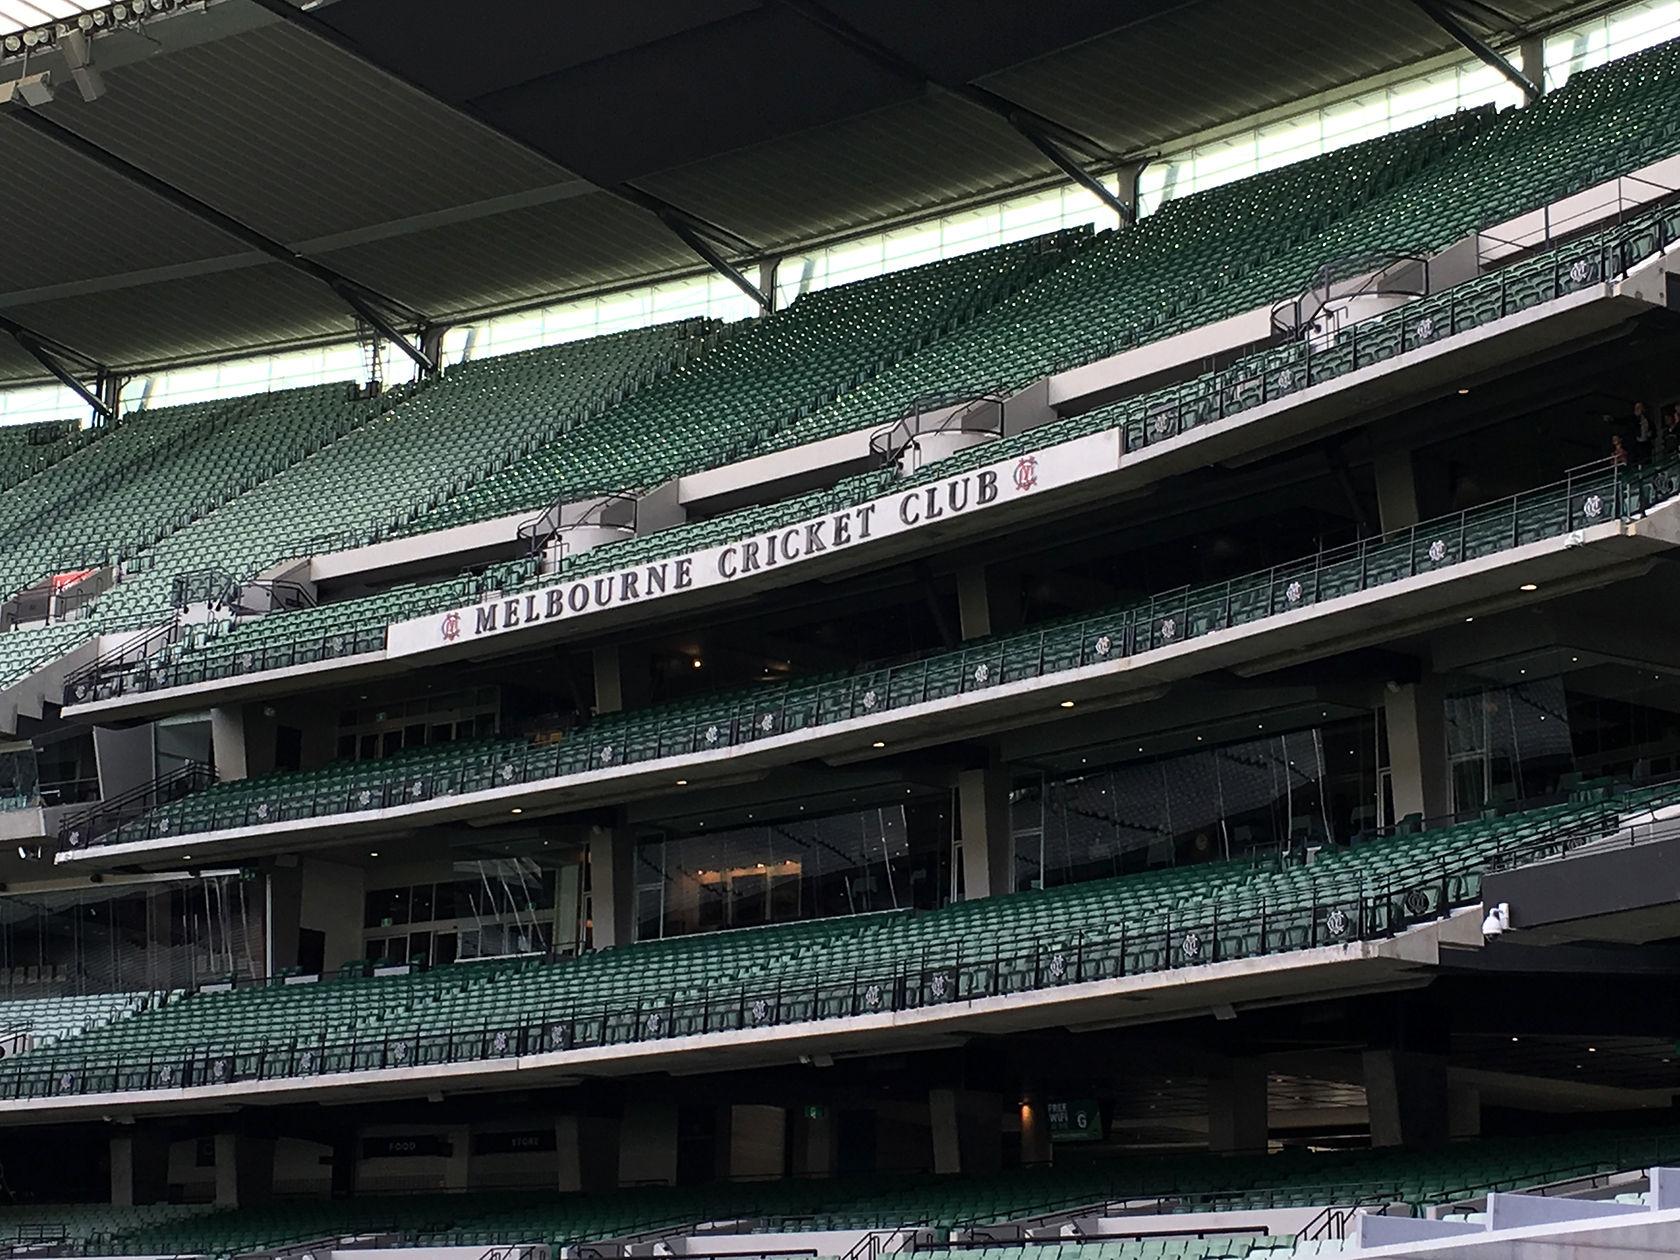 Melbourne Cricket Grounds @MCG - Ginger and Nutmeg Ginger